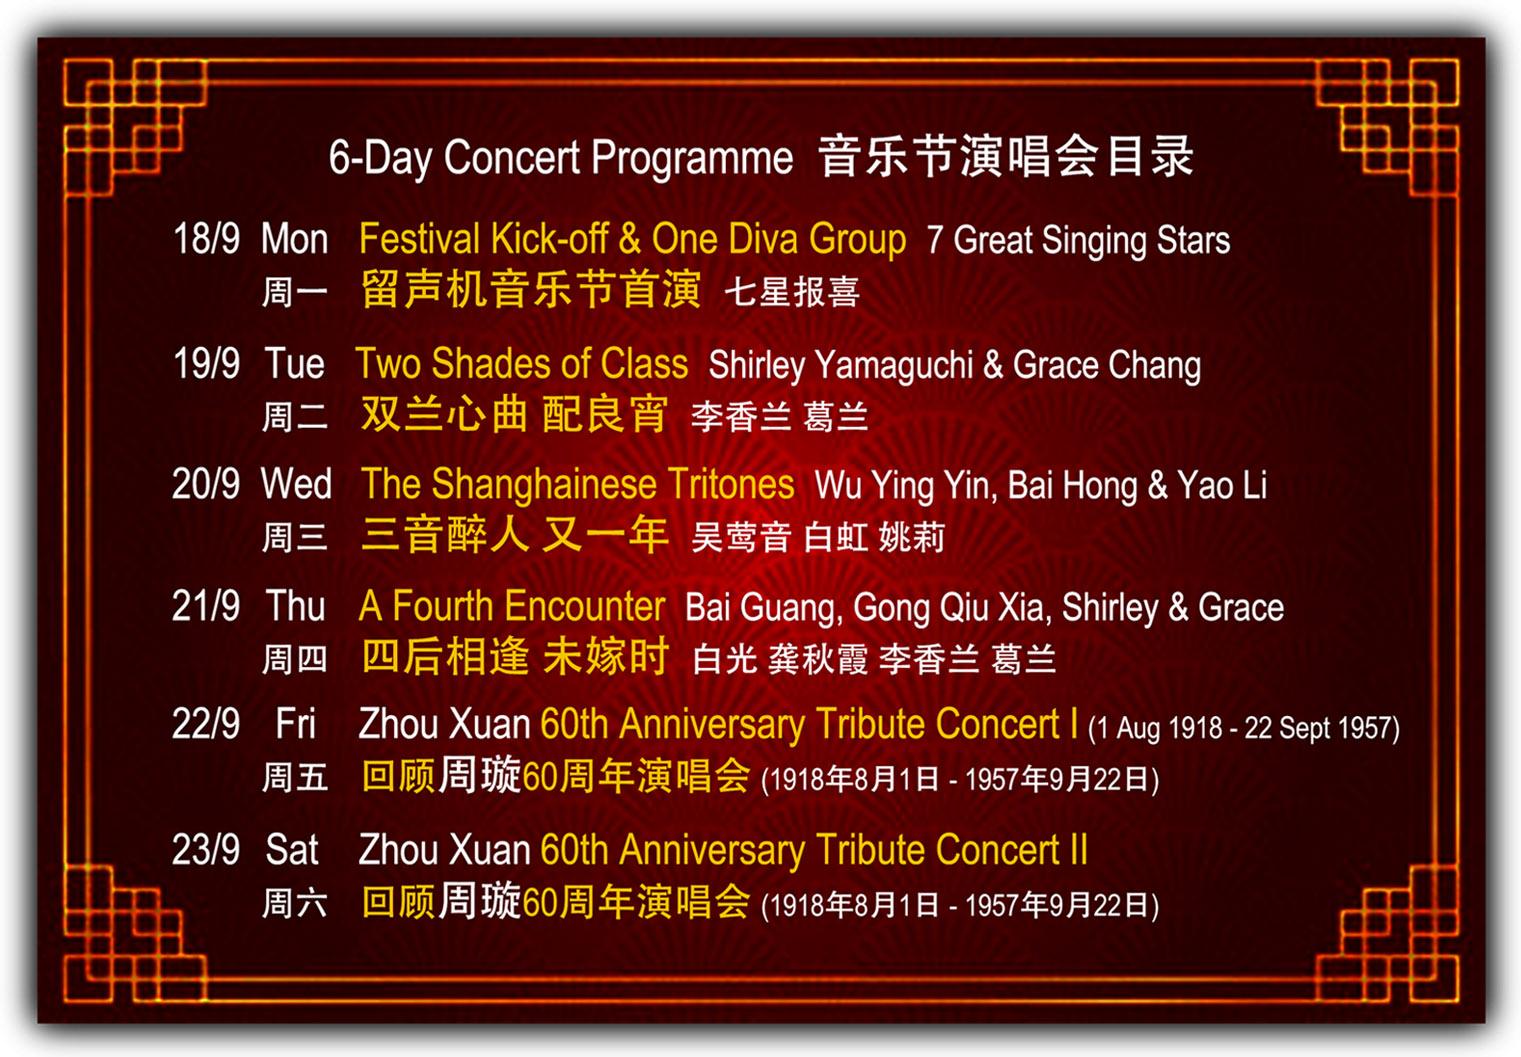 6-Day Concert List